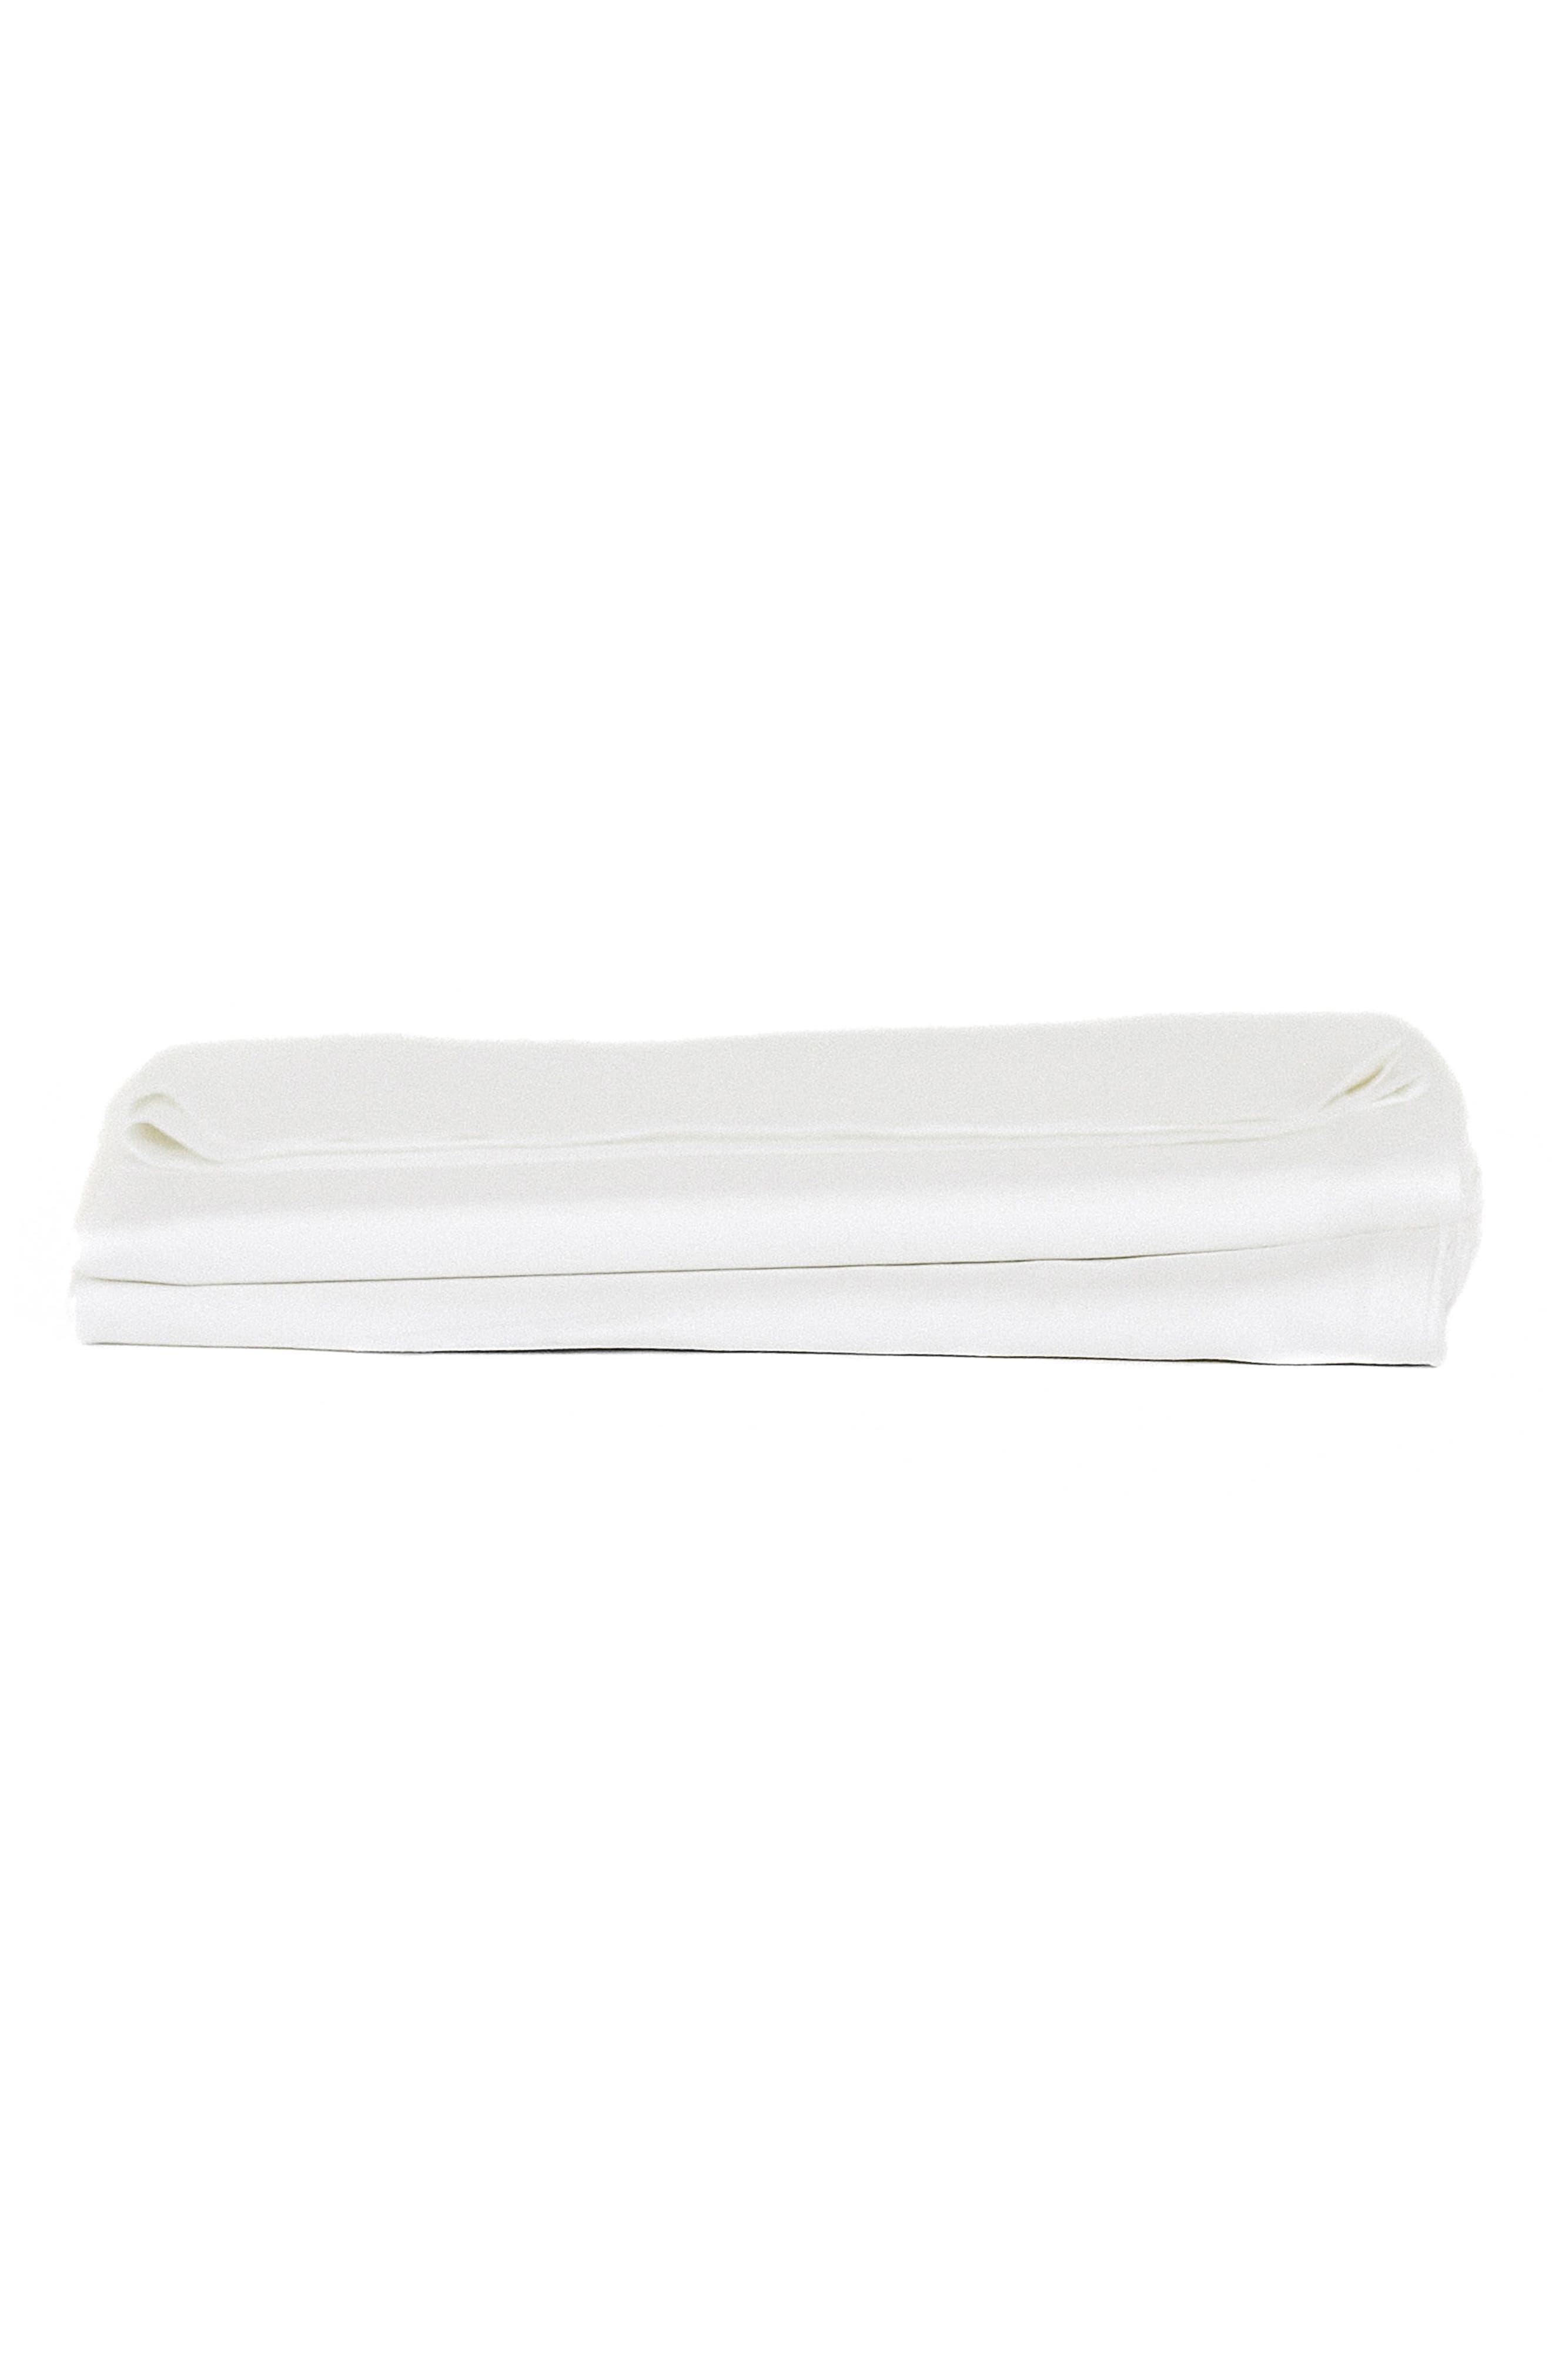 Pillowcase,                             Alternate thumbnail 2, color,                             WHITE